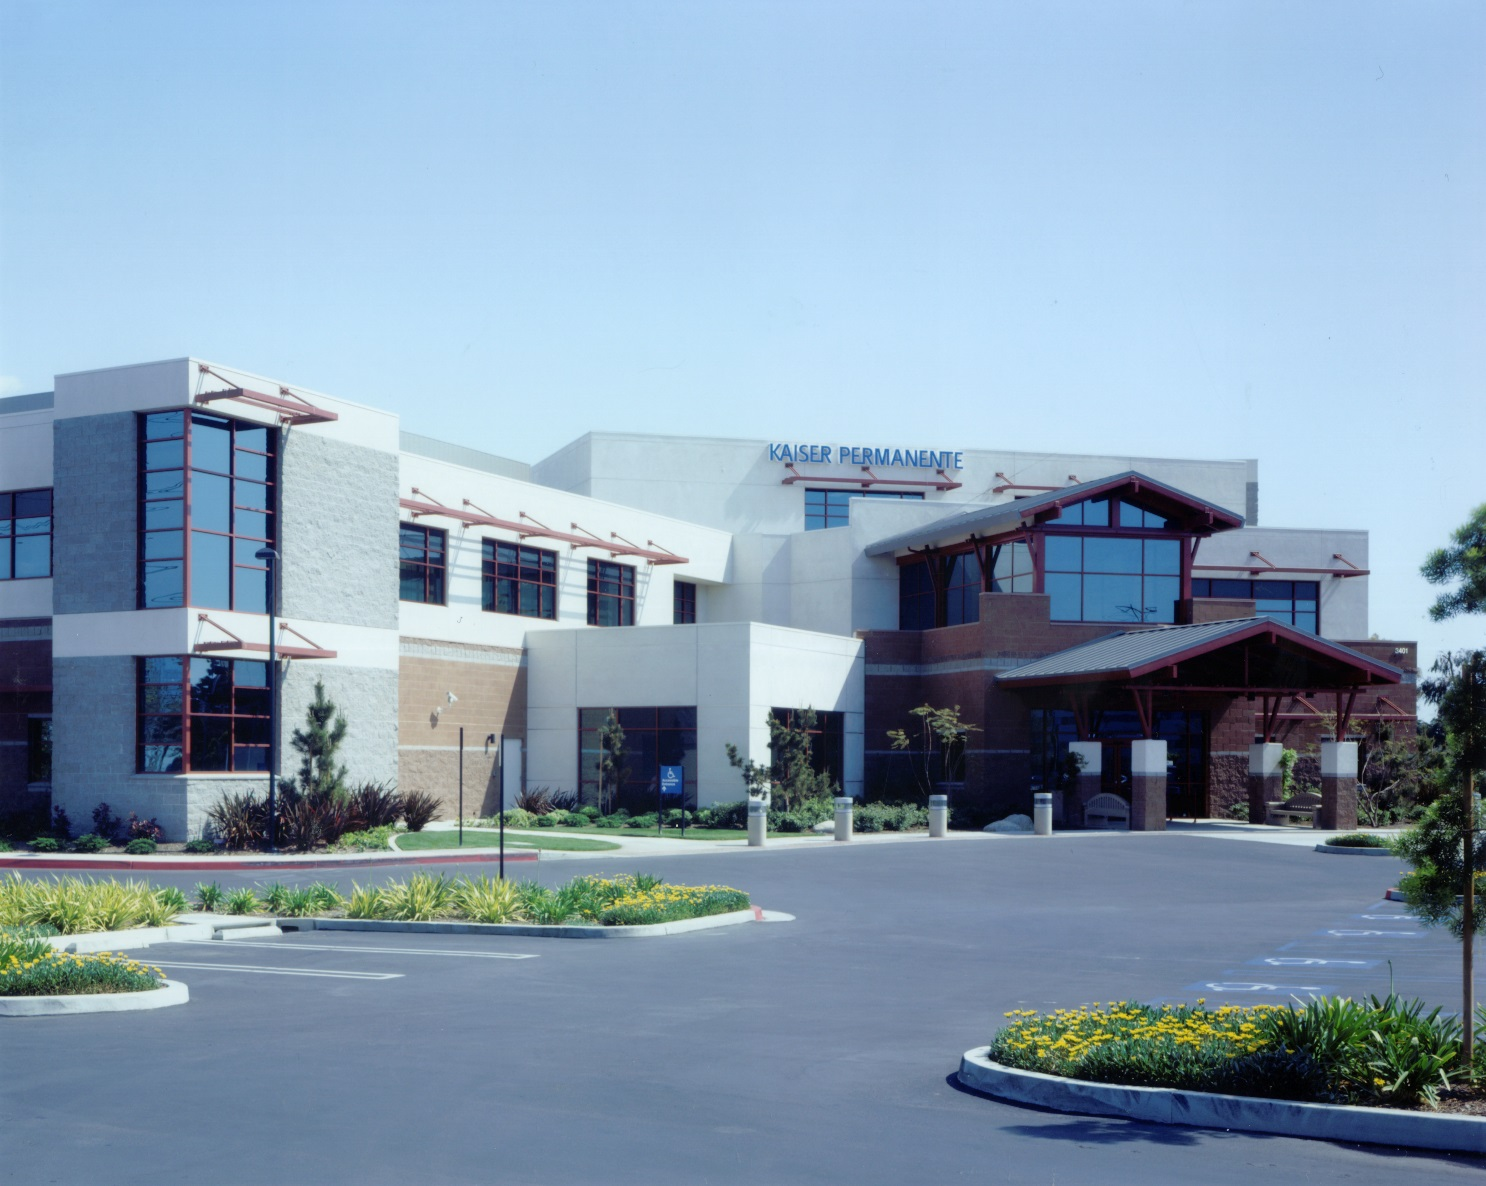 Kaiser Permanente Harbor MacArthur Medical Office Building